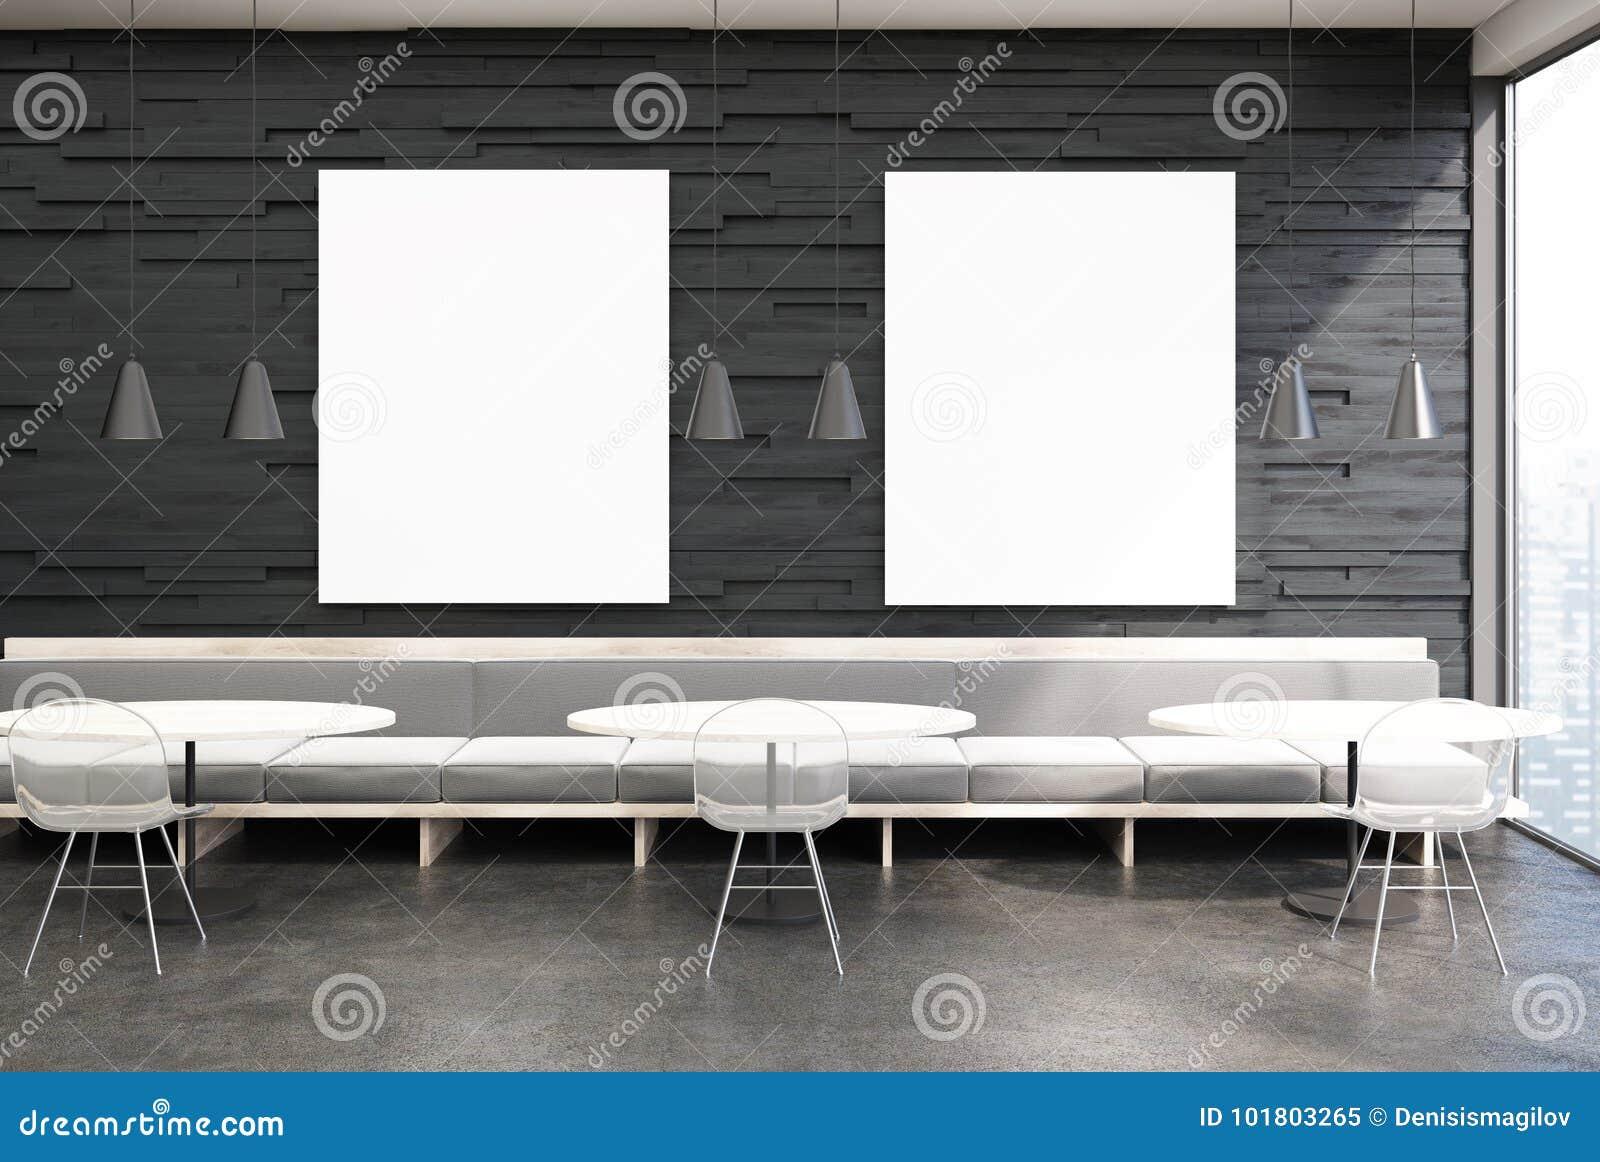 Astonishing Black Cafe Interior Gray Sofas Two Posters Stock Machost Co Dining Chair Design Ideas Machostcouk